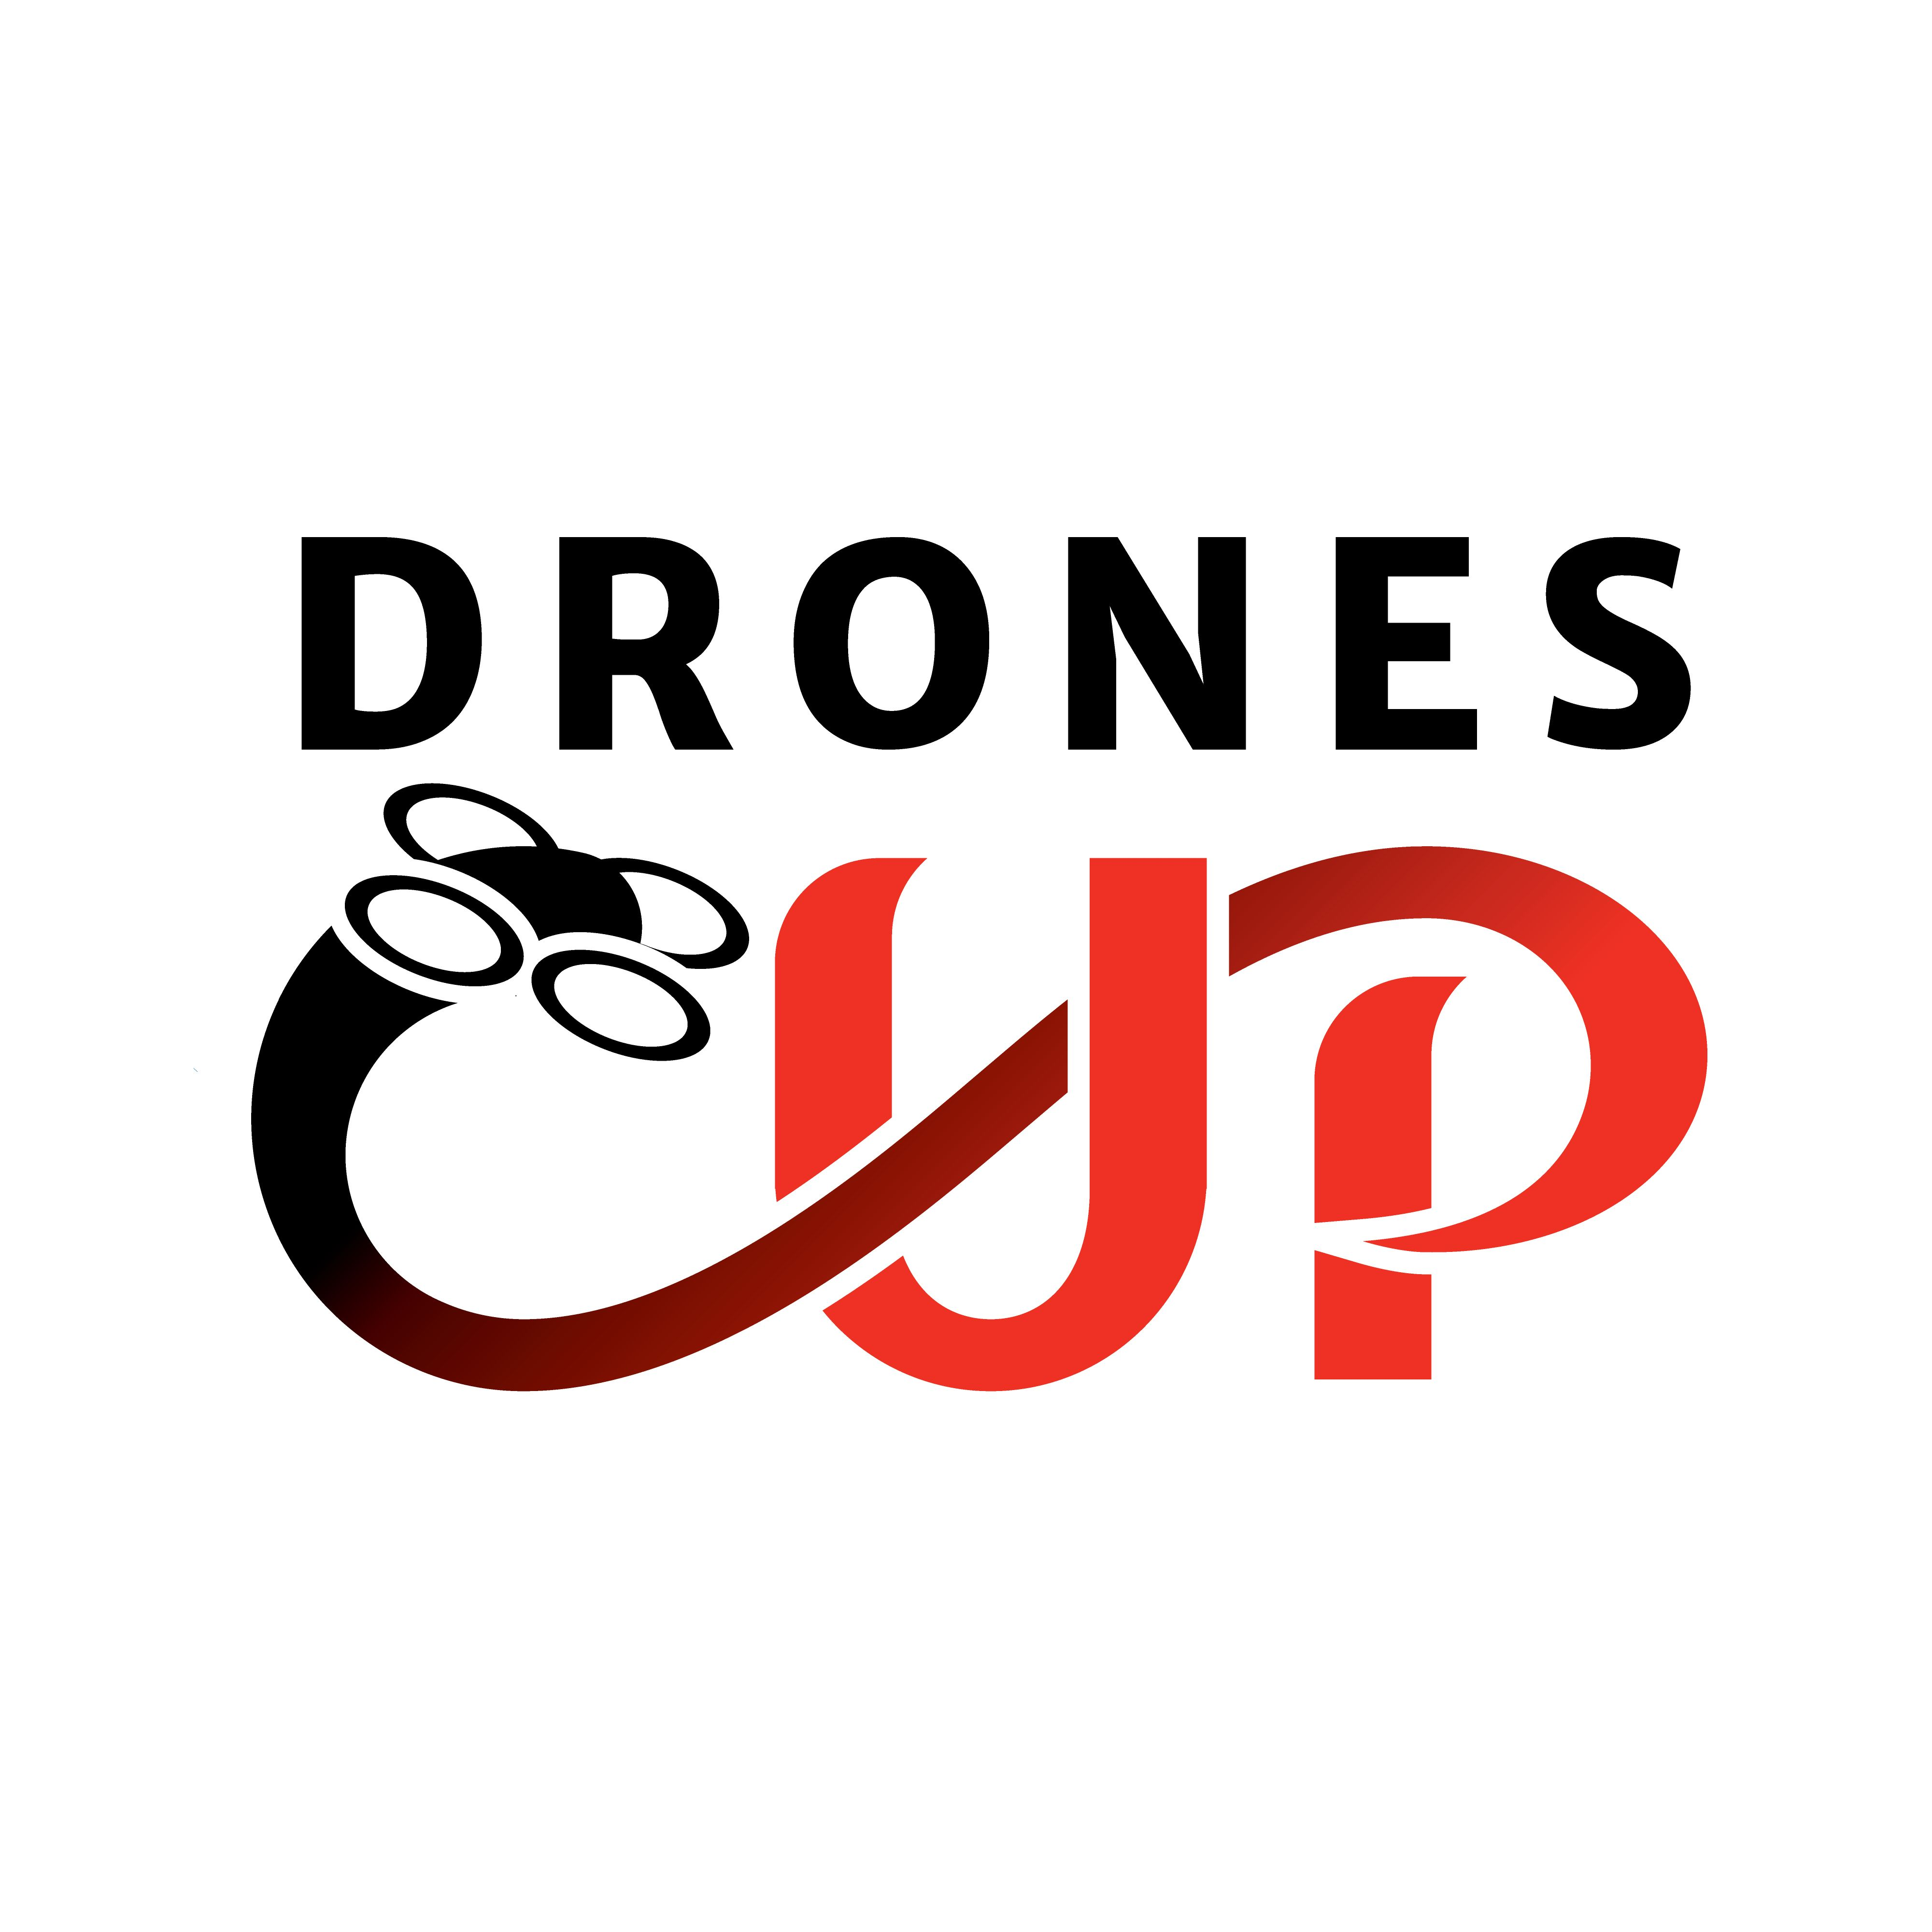 drone racing event logo design the best of my logo designs rh pinterest com Automotive Parts Logos Cool Car Body Shops Logos